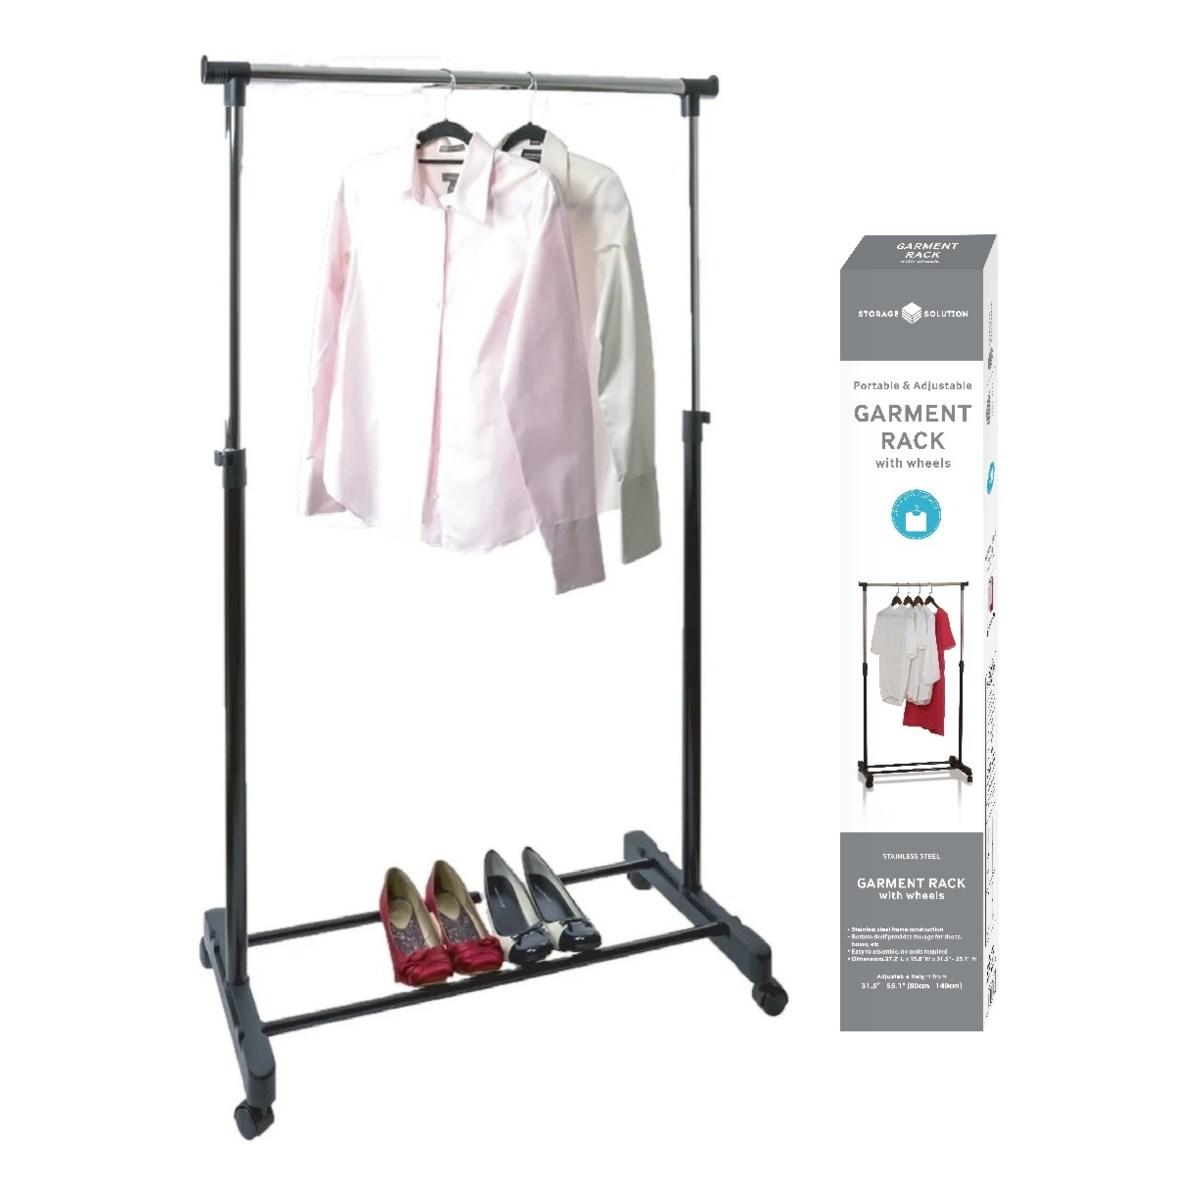 Adjustable Garment Rack (6)